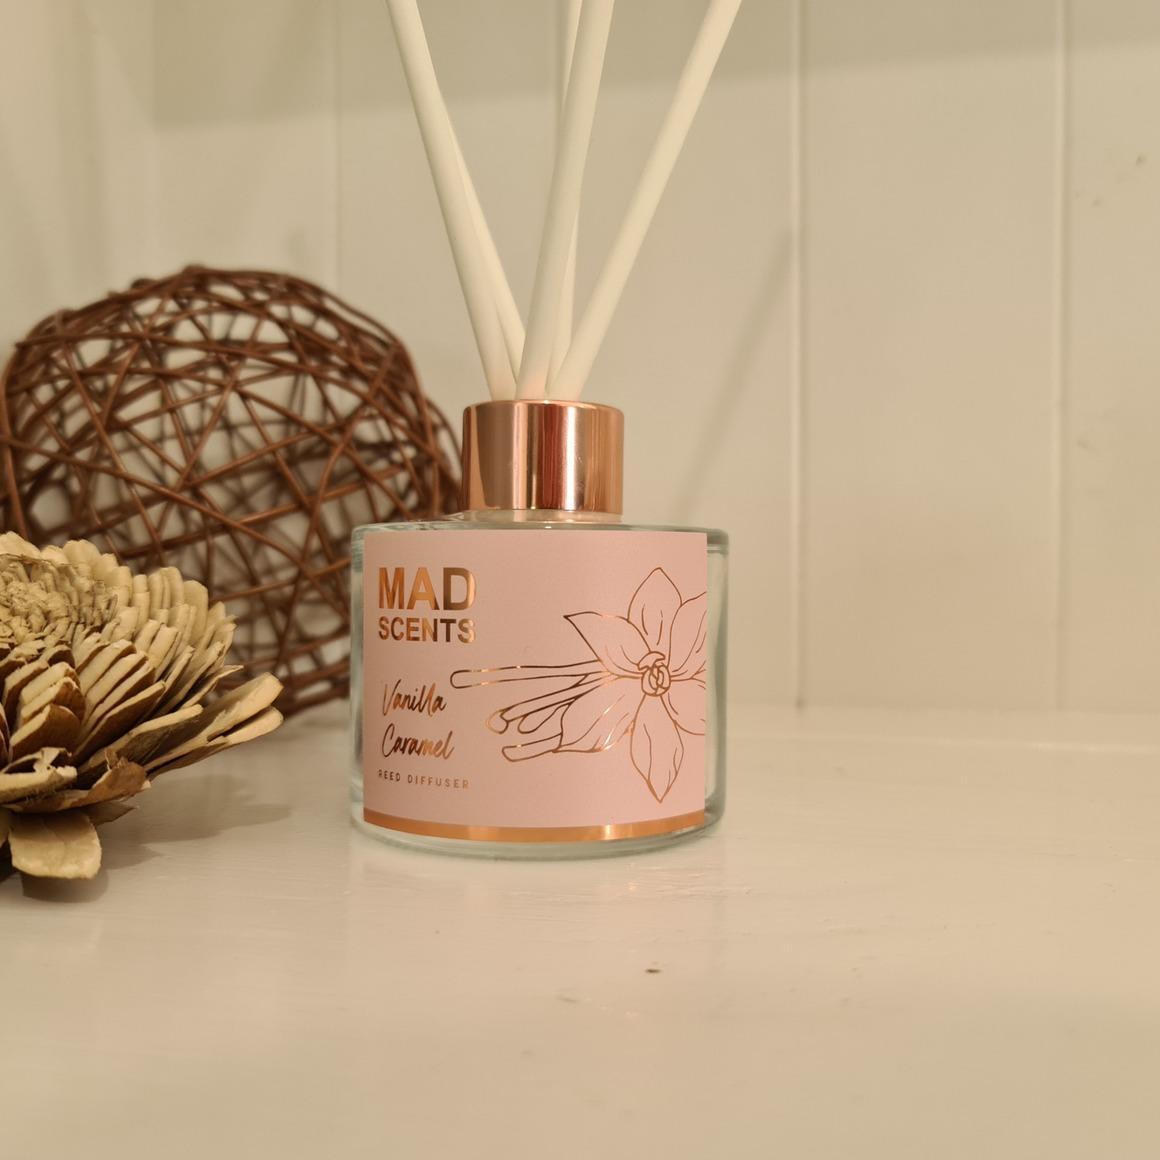 Vanilla Caramel reed diffuser | Trada Marketplace